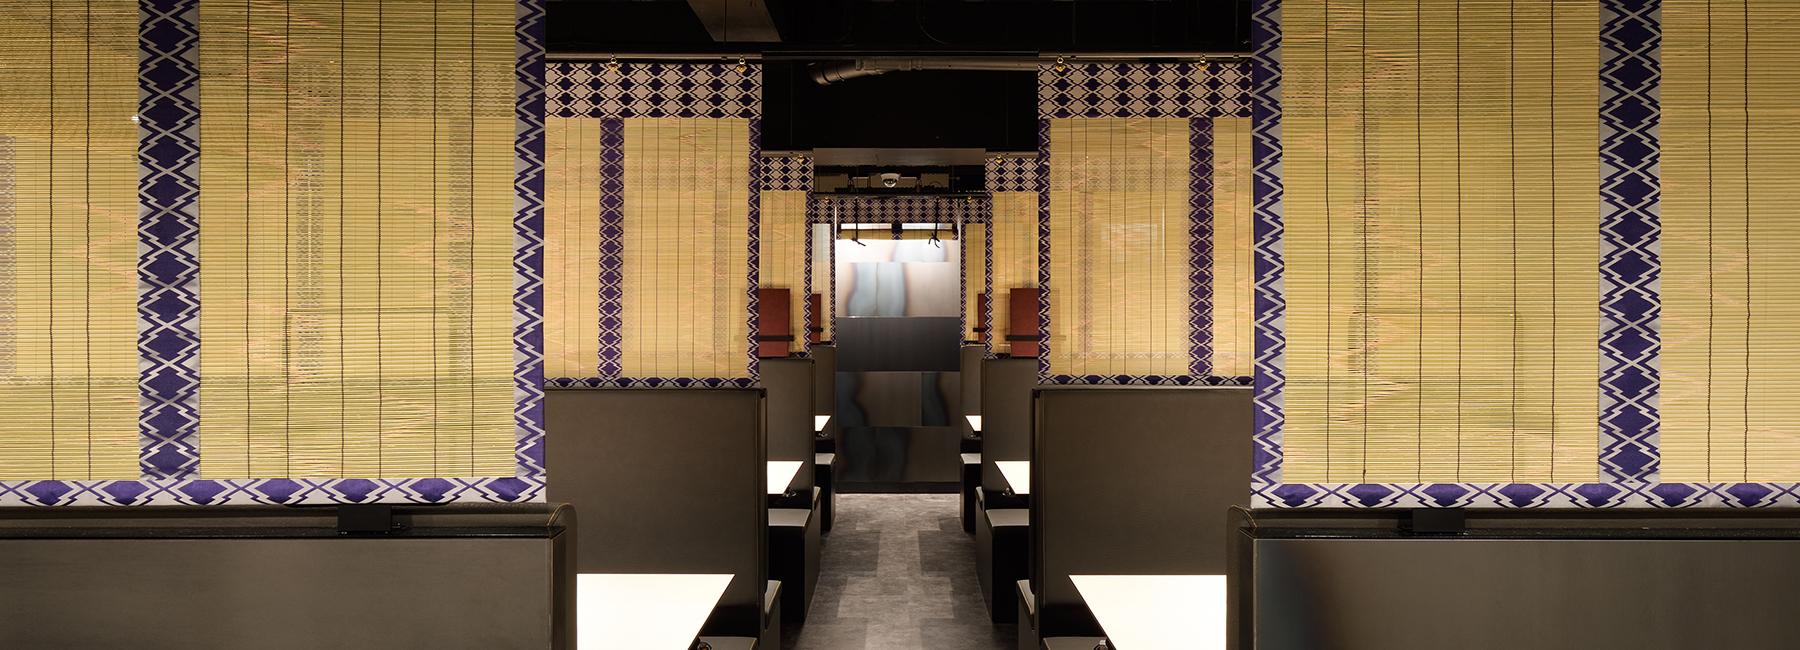 Yakiniku Yazawa Restaurant in Kyoto (10 pics)